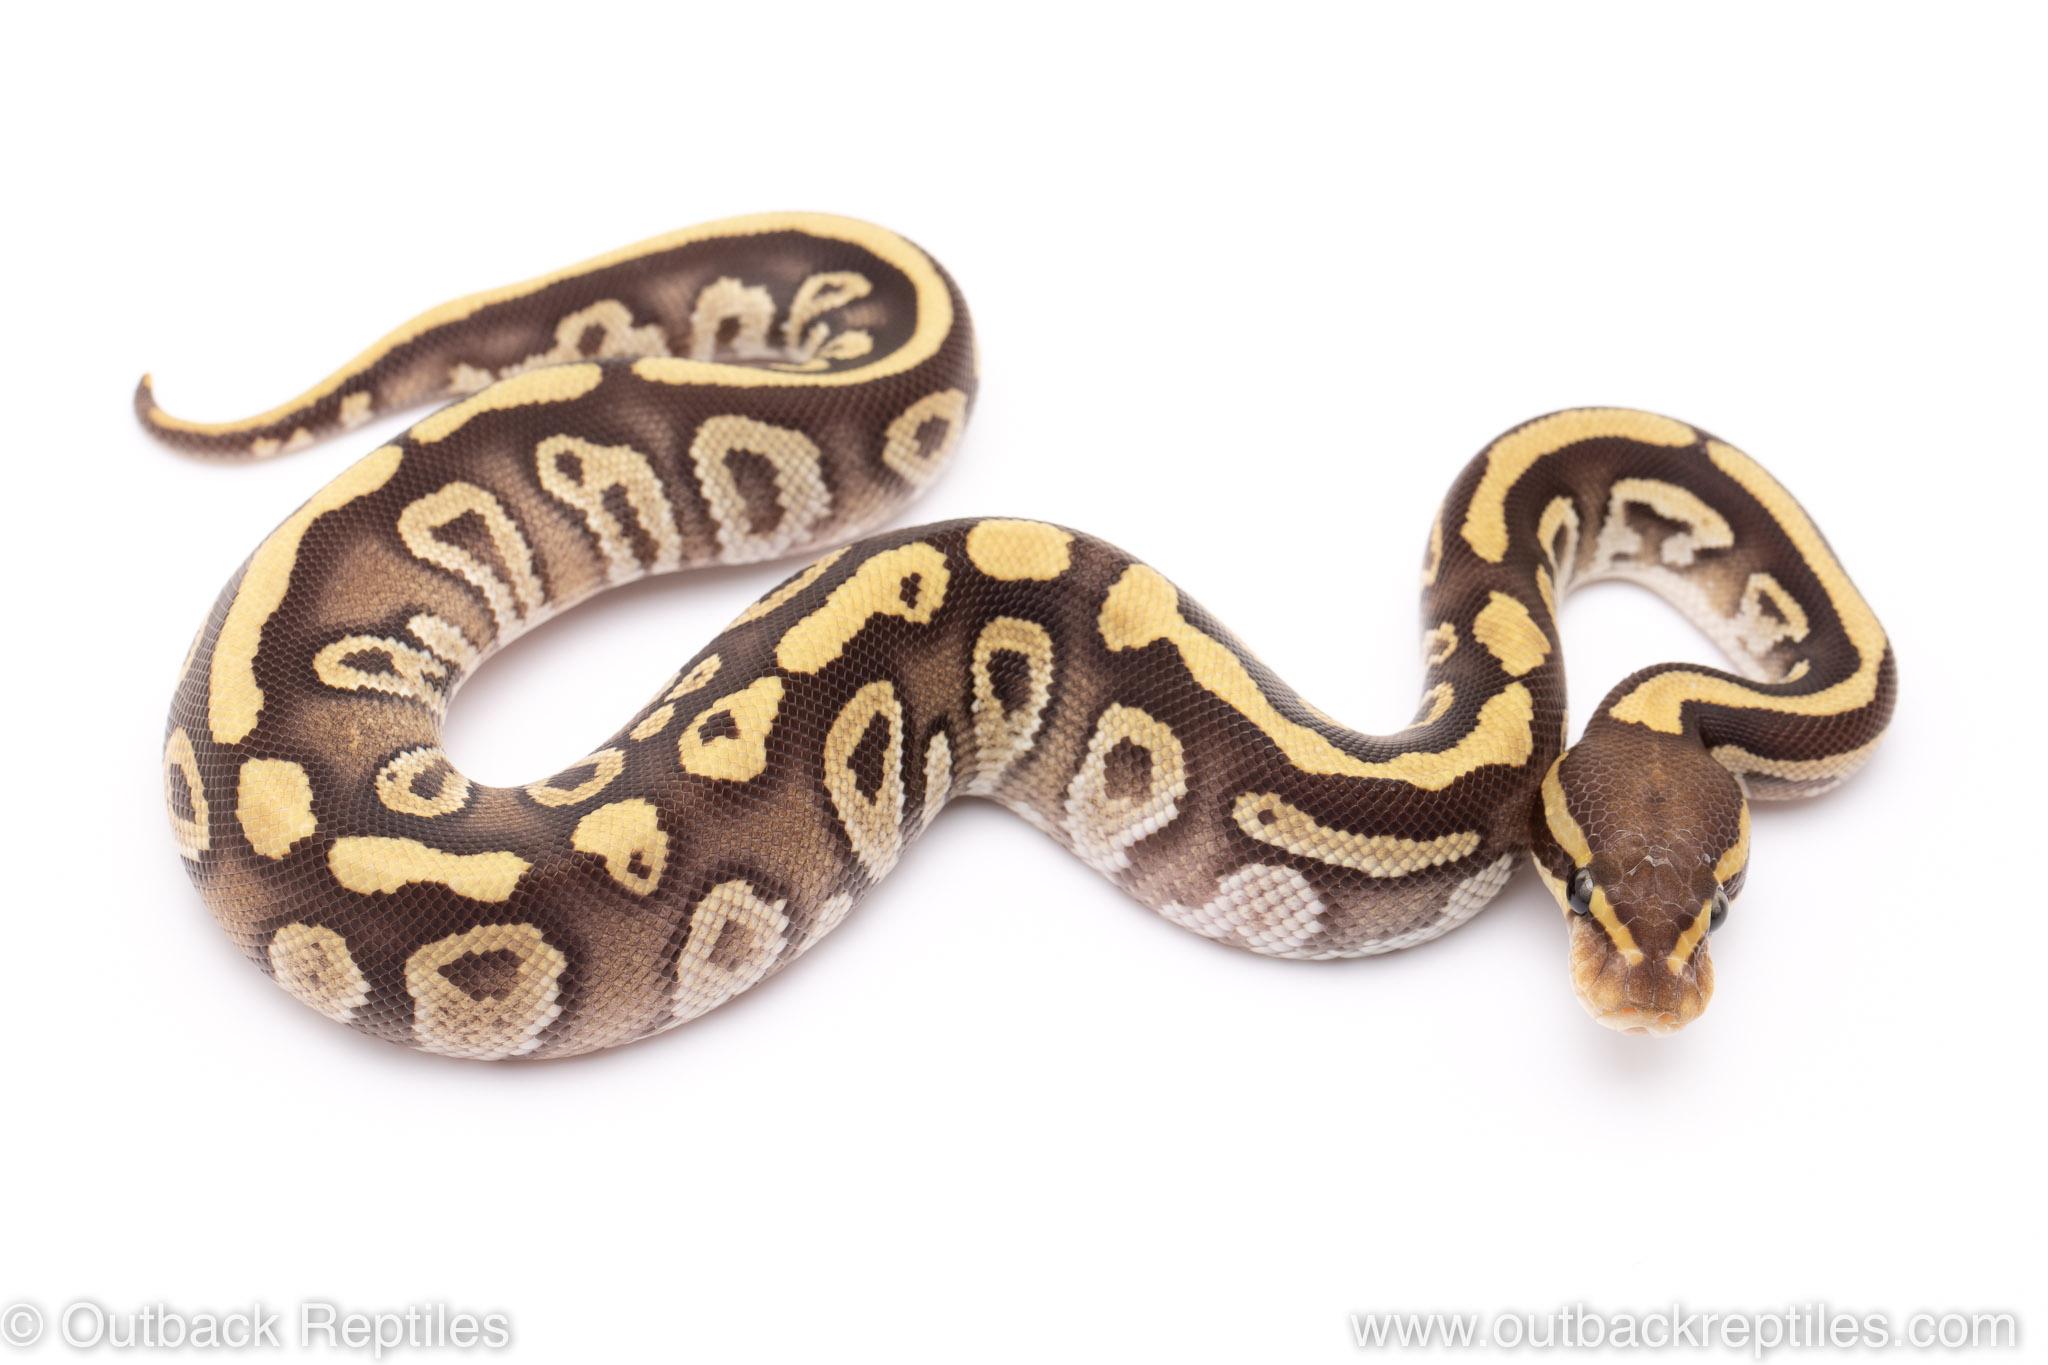 Mojave Fire ball python for sale